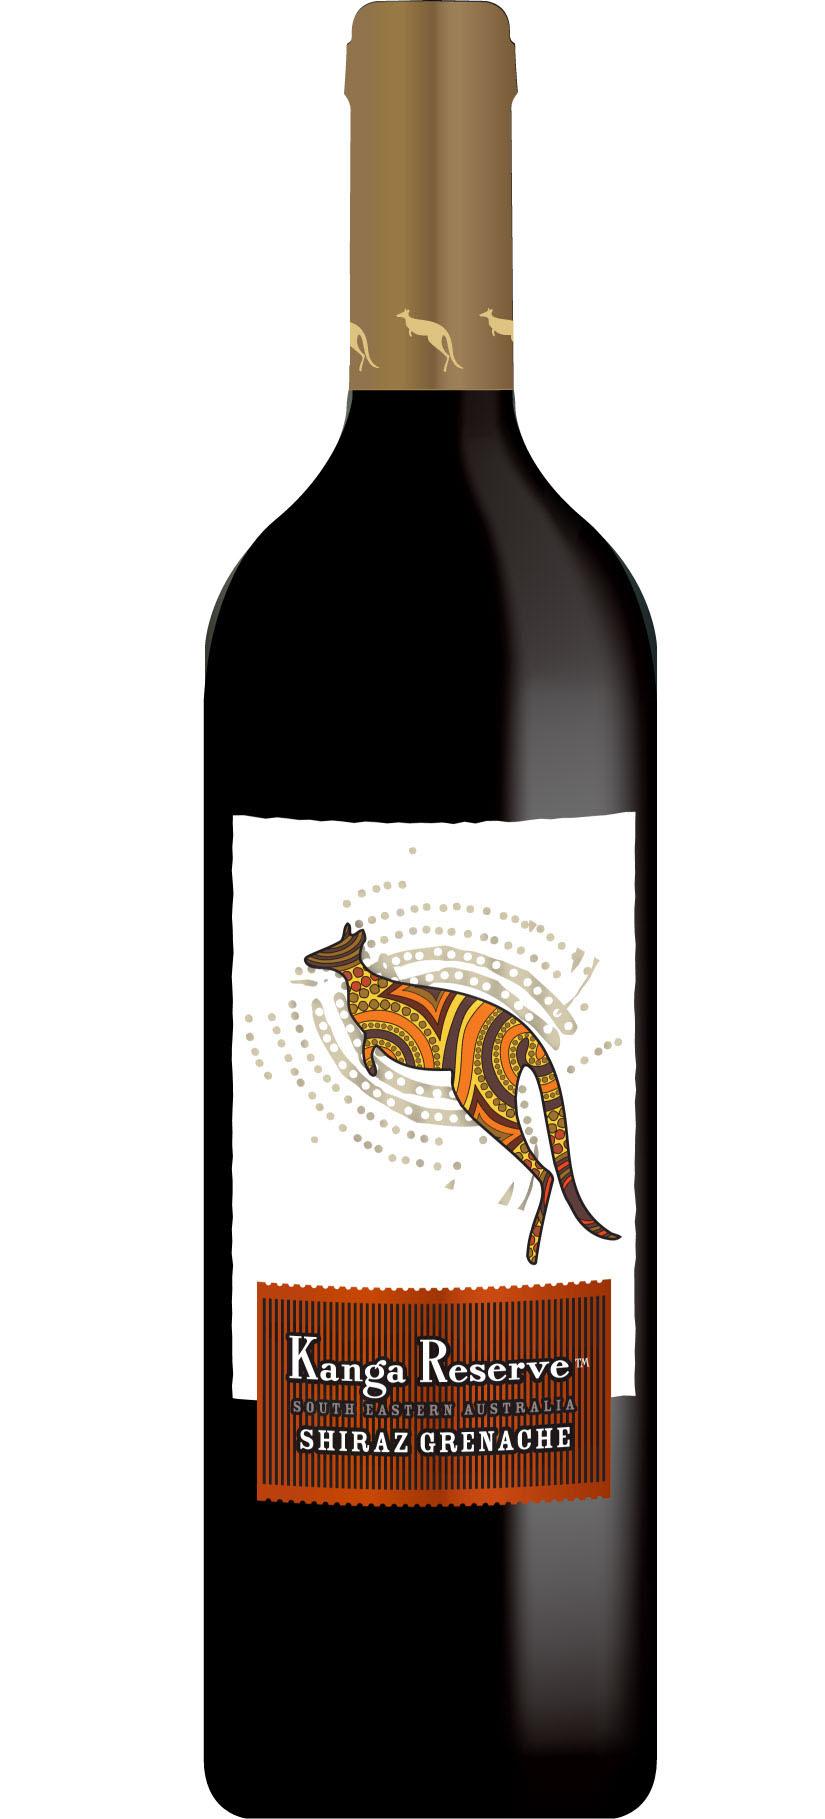 Kangaroo wine label